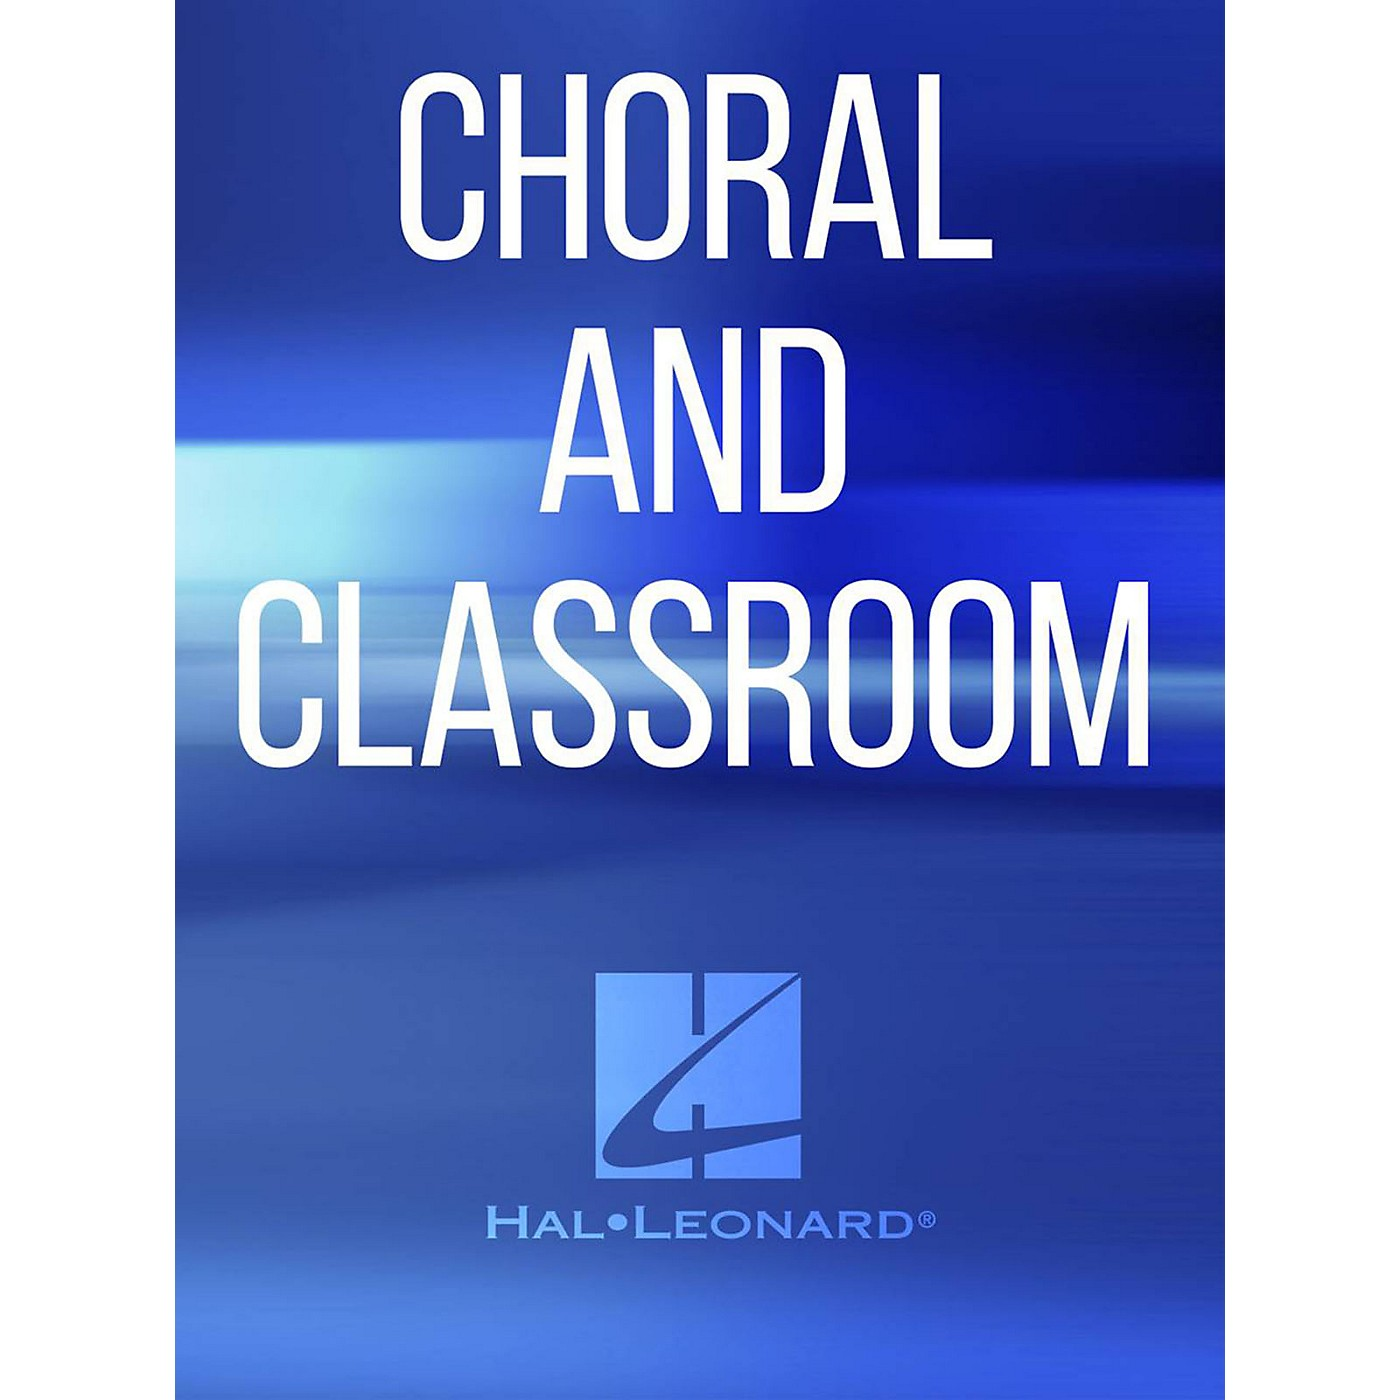 Hal Leonard Zip-A-Dee-Doo-Dah (Theme and Variations) SAB Arranged by Mac Huff thumbnail